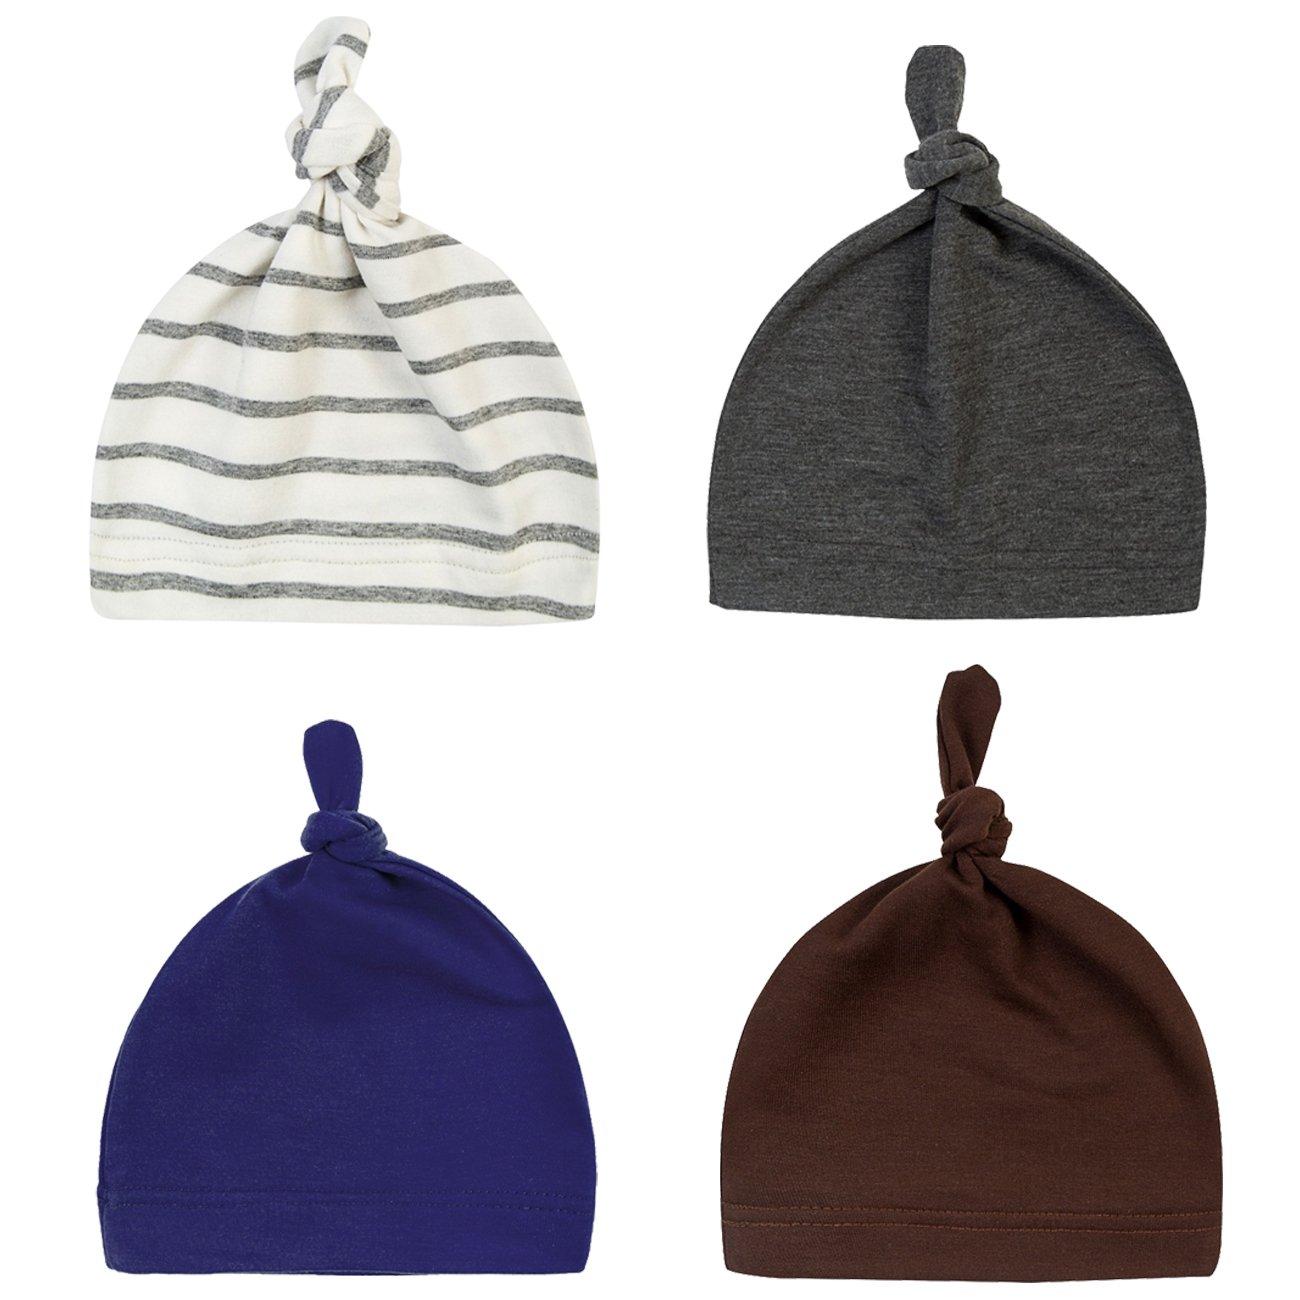 DRESHOW BQUBO Newborn Hat Knotted Hospital Hats Boys Infant Cap Baby Beanies HT0005-1